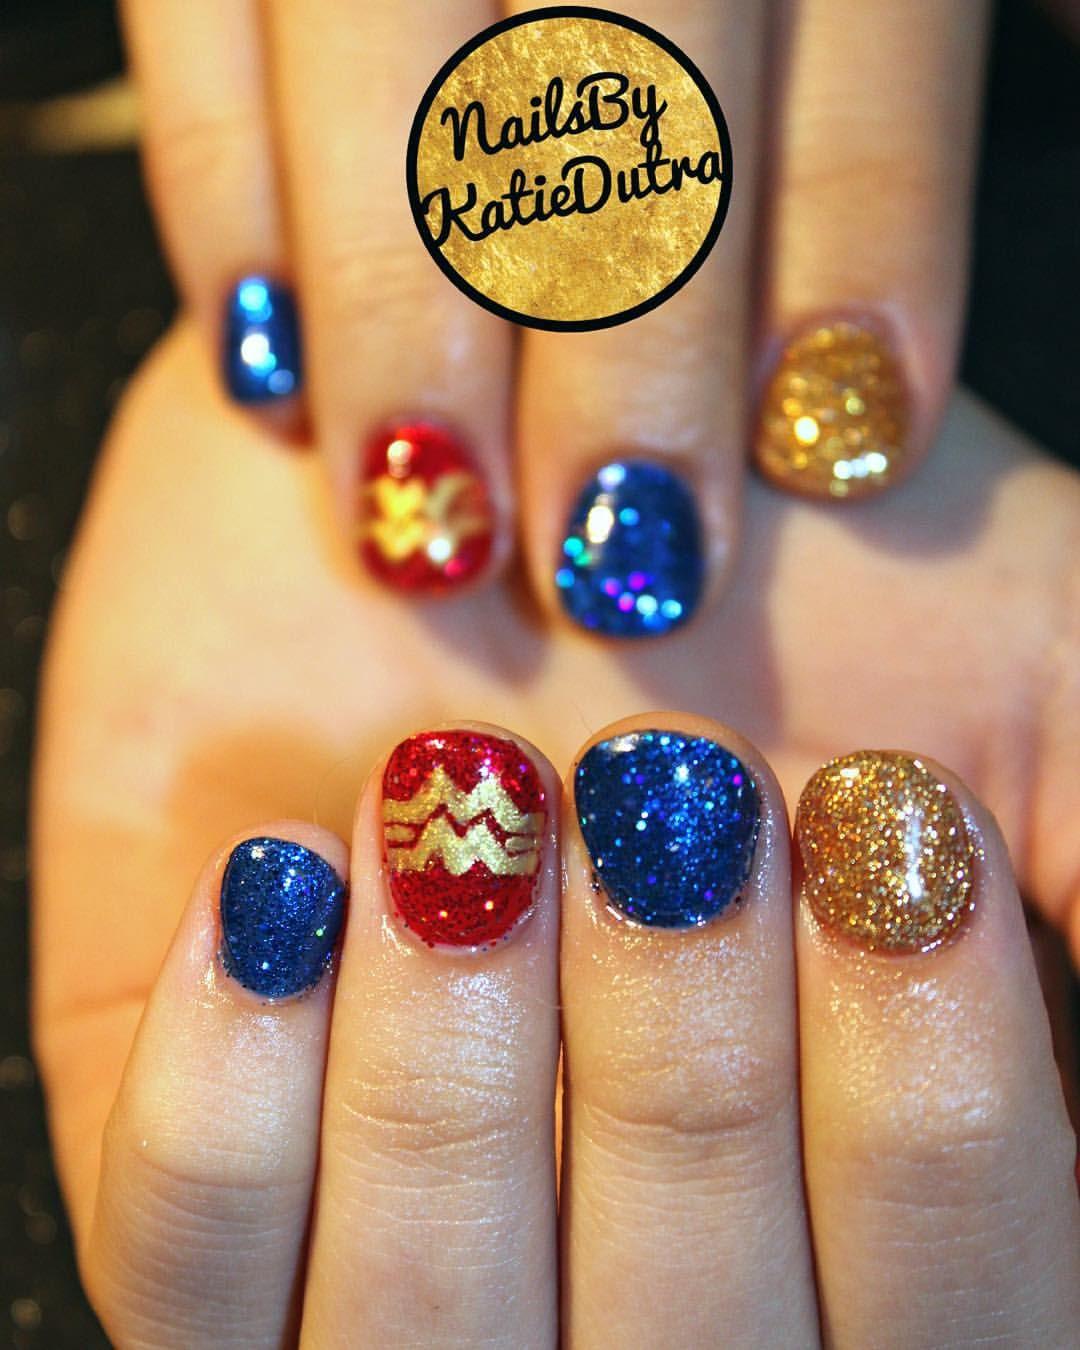 Glitter gel nails Wonder Woman nail art | Nails by Katie ...